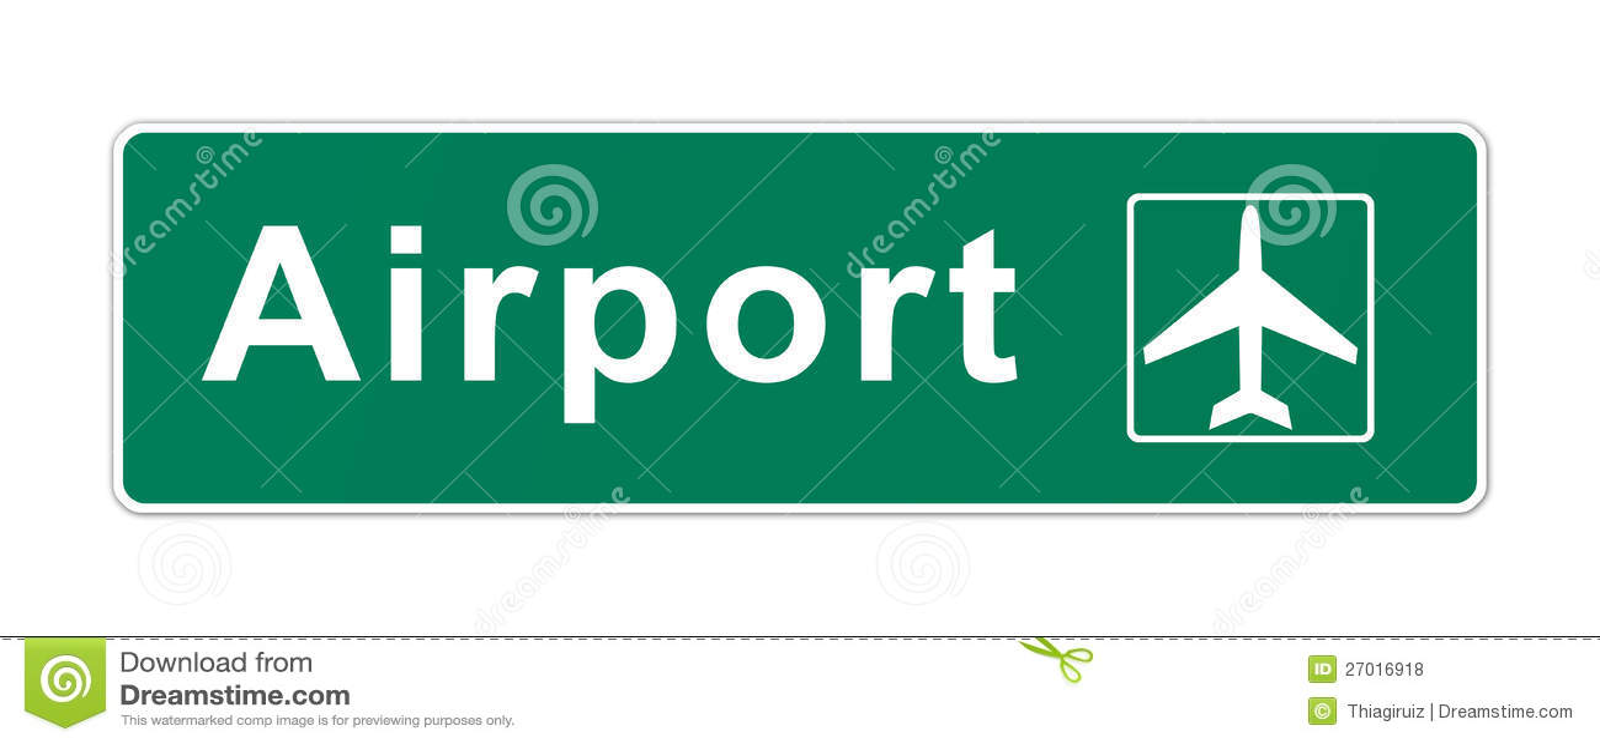 Airport Sign stock illustration. Illustration of info ...